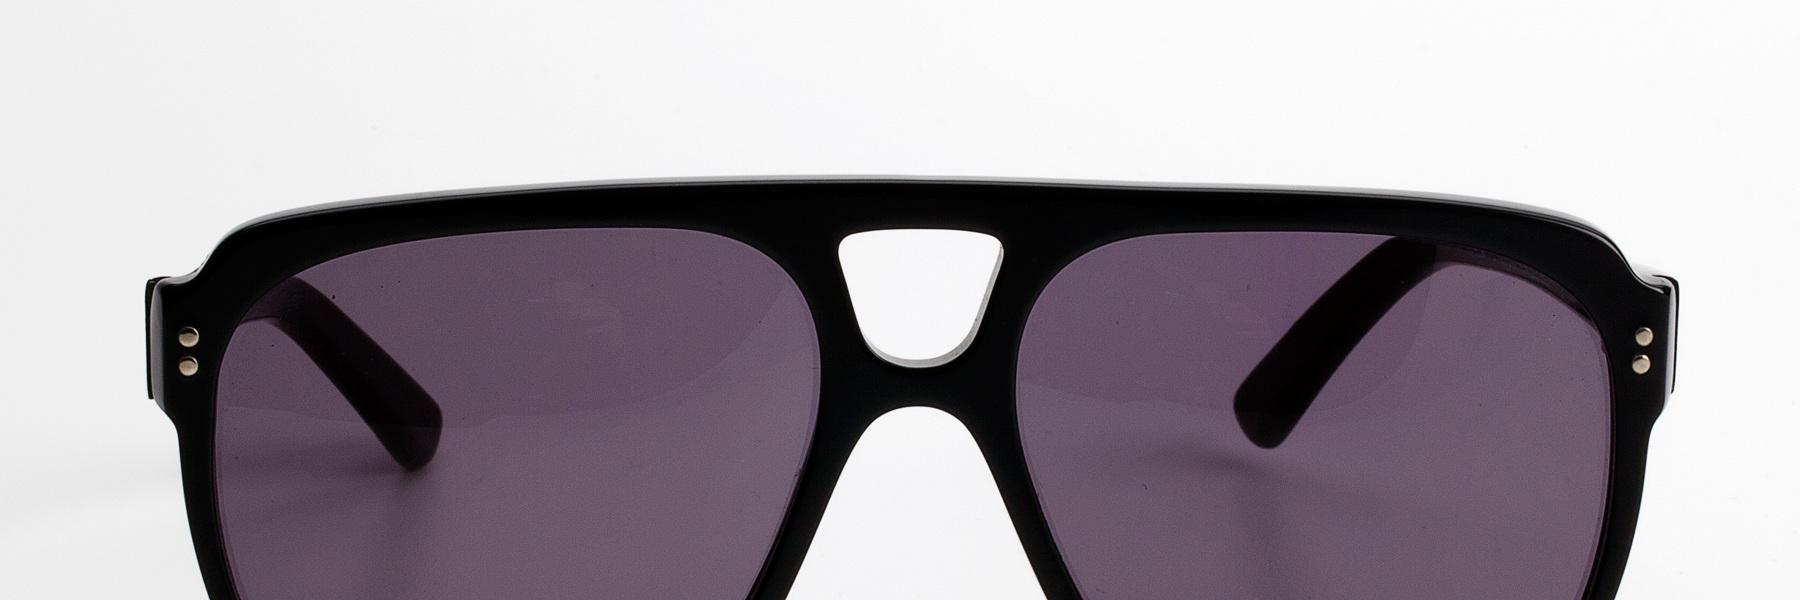 Barcelona Wilde Sunglasses Local Wilde Sunglasses